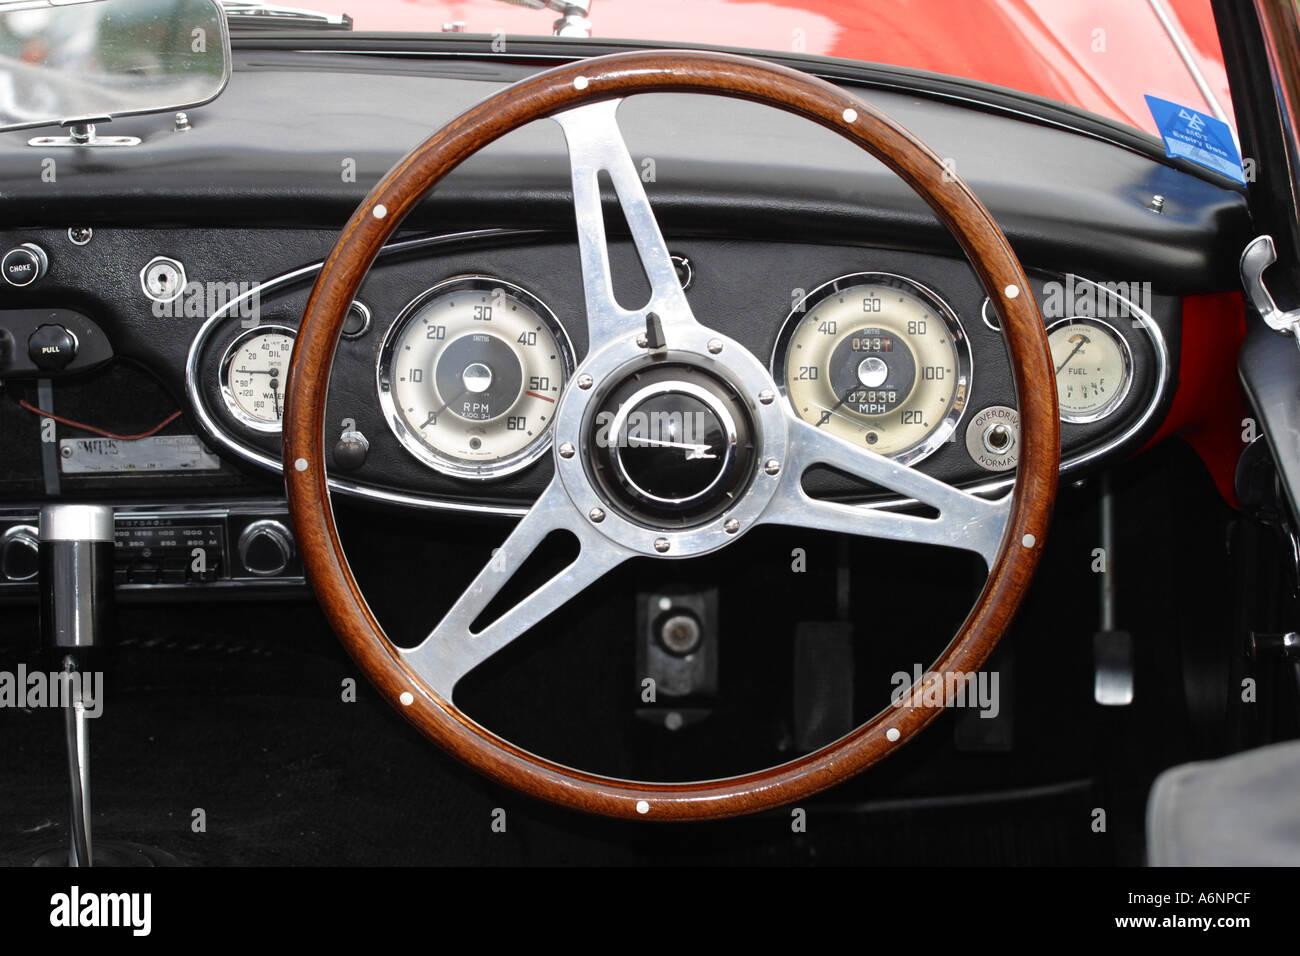 Austin Healey 3000 Sport Car Dashboard And Steering Wheel